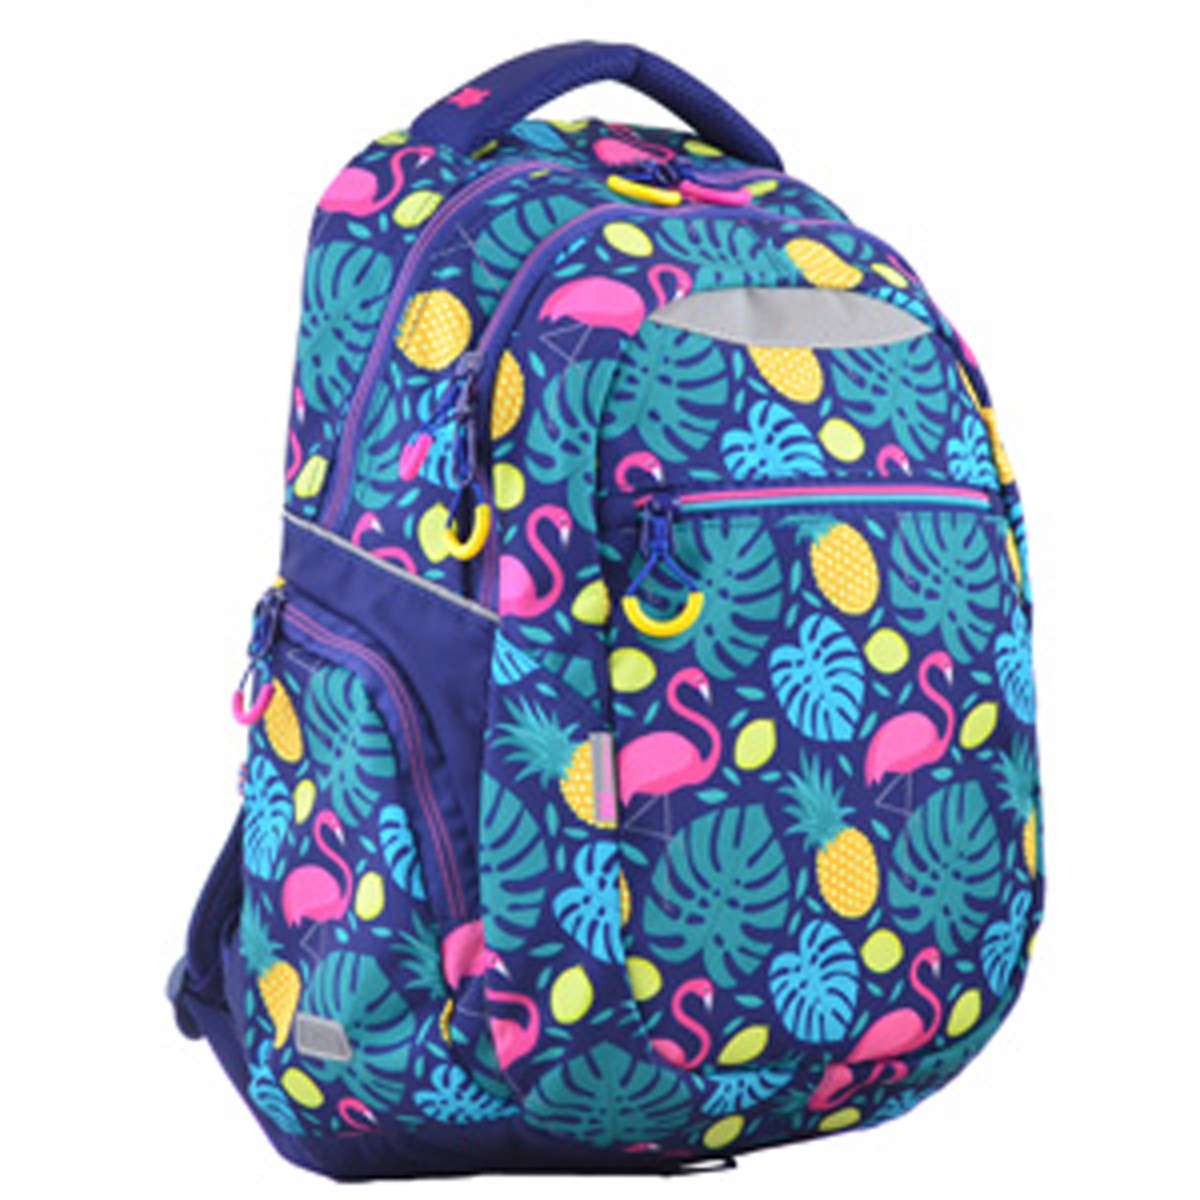 Рюкзак молодежный YES T-23 Flamingo, 45*31*14.5 554796